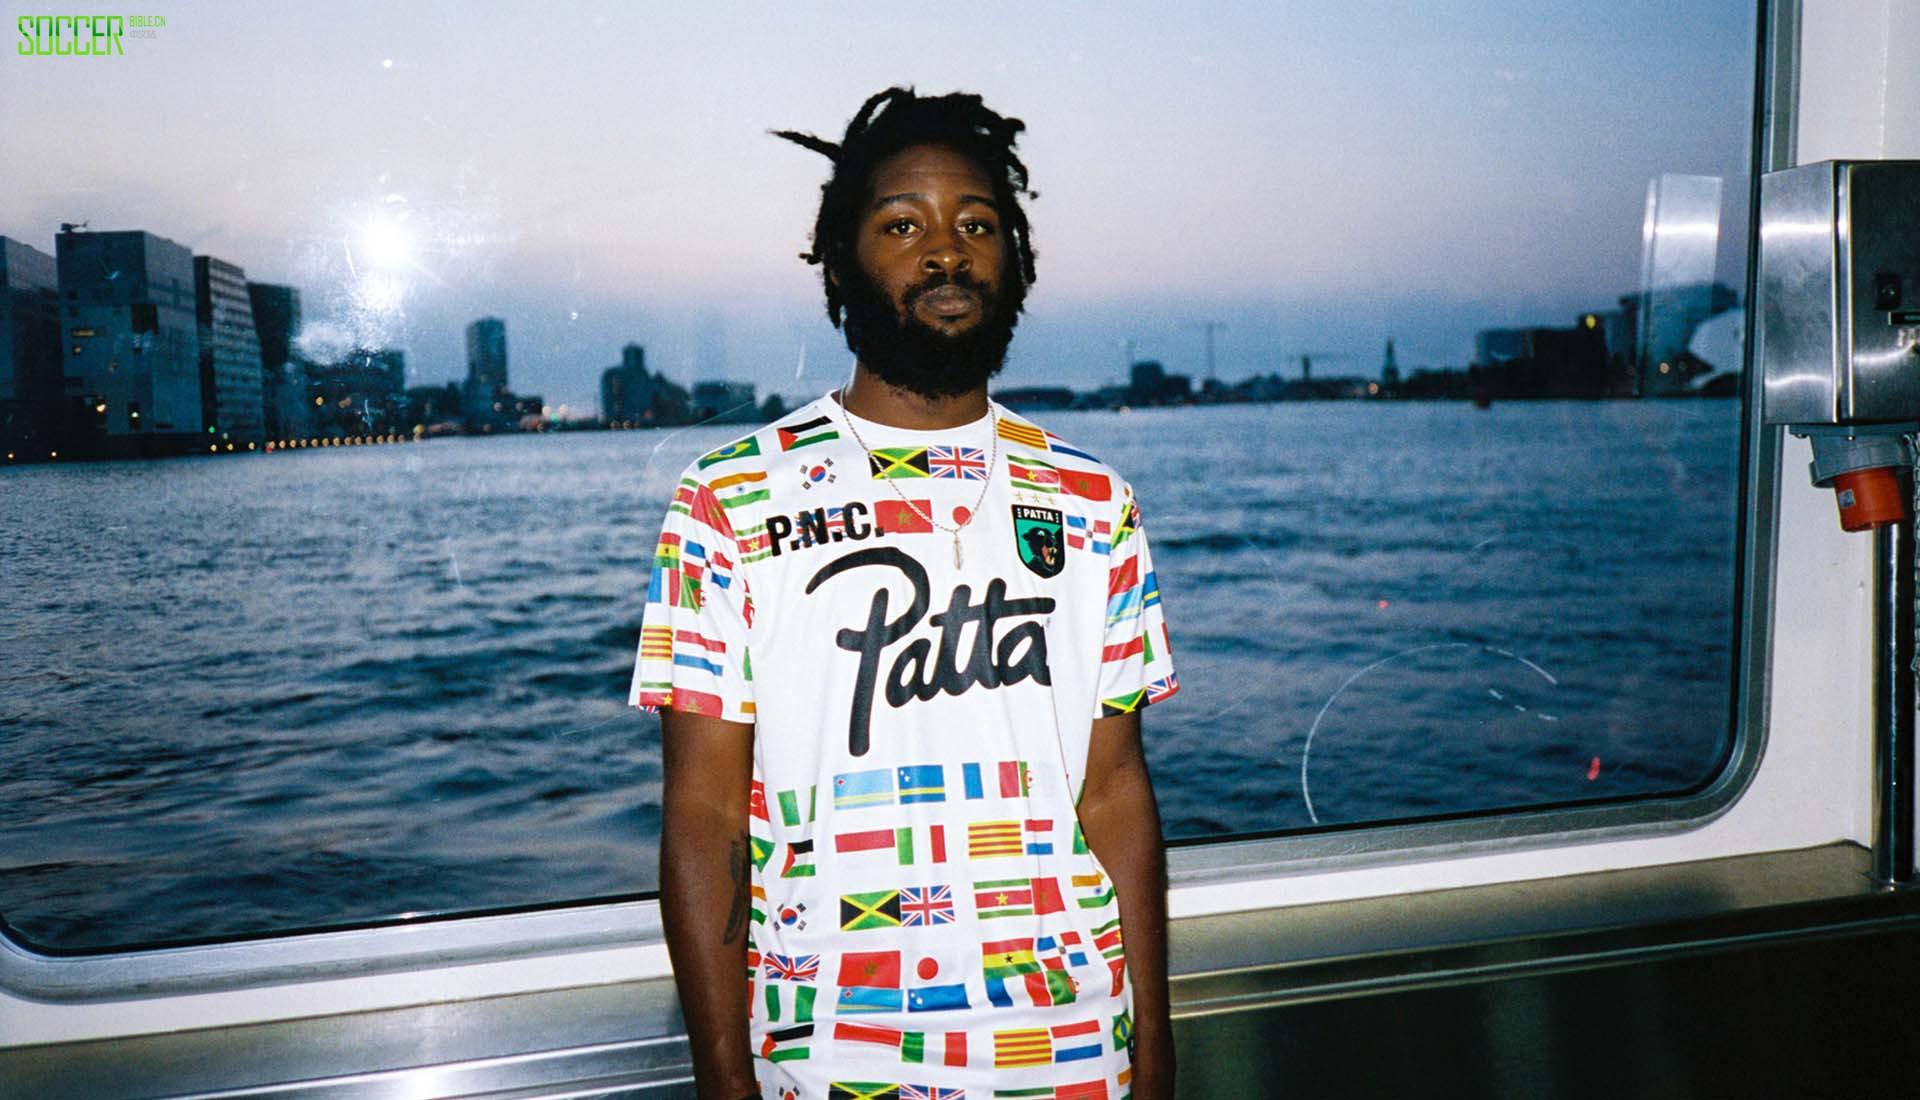 Patta发行特别版足球球衣